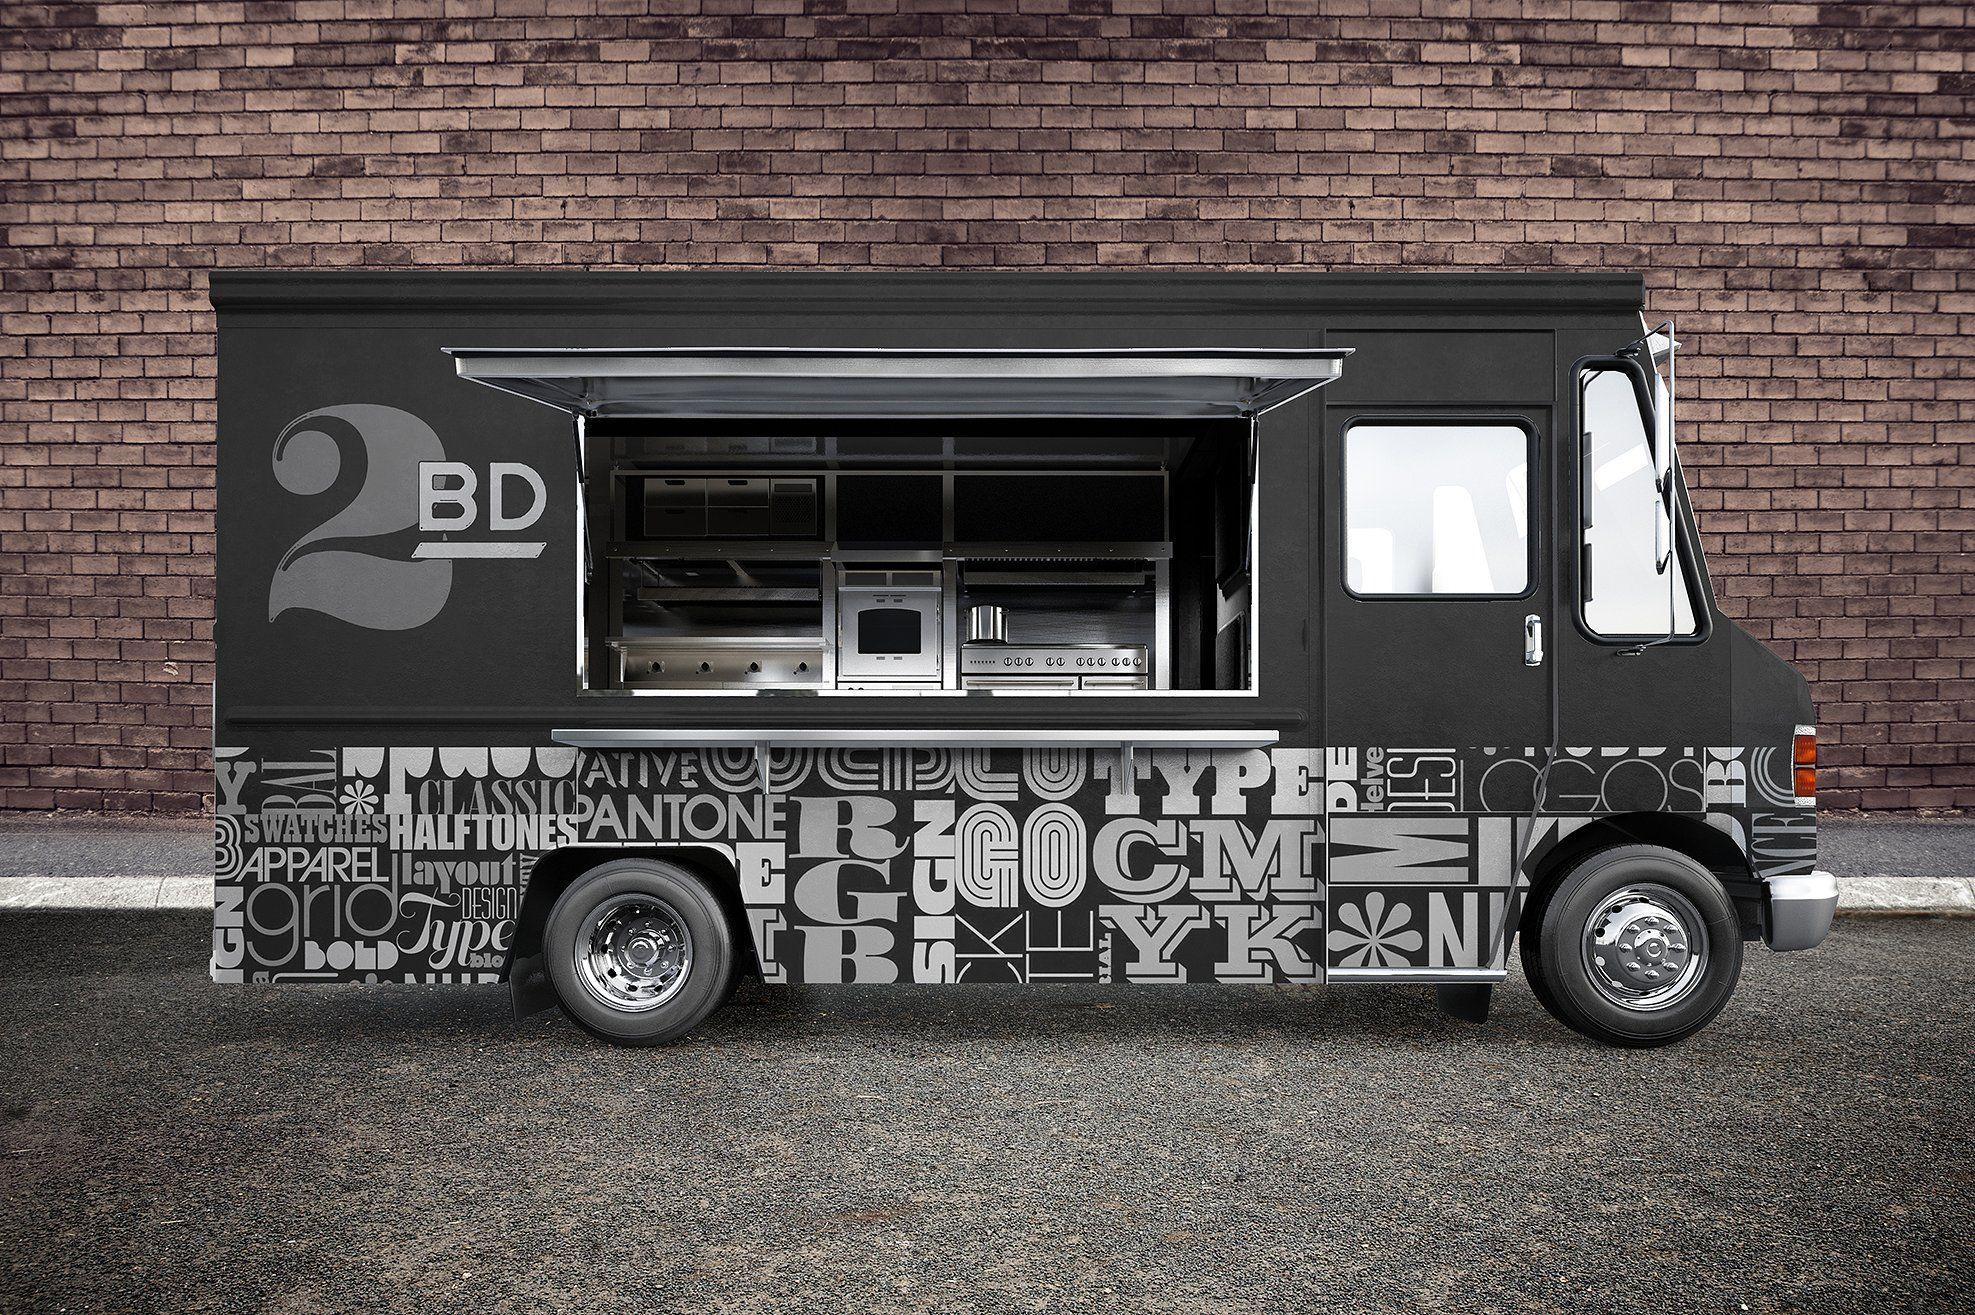 Food Truck Psd Mockup Food Truck Design Food Truck Truck Design